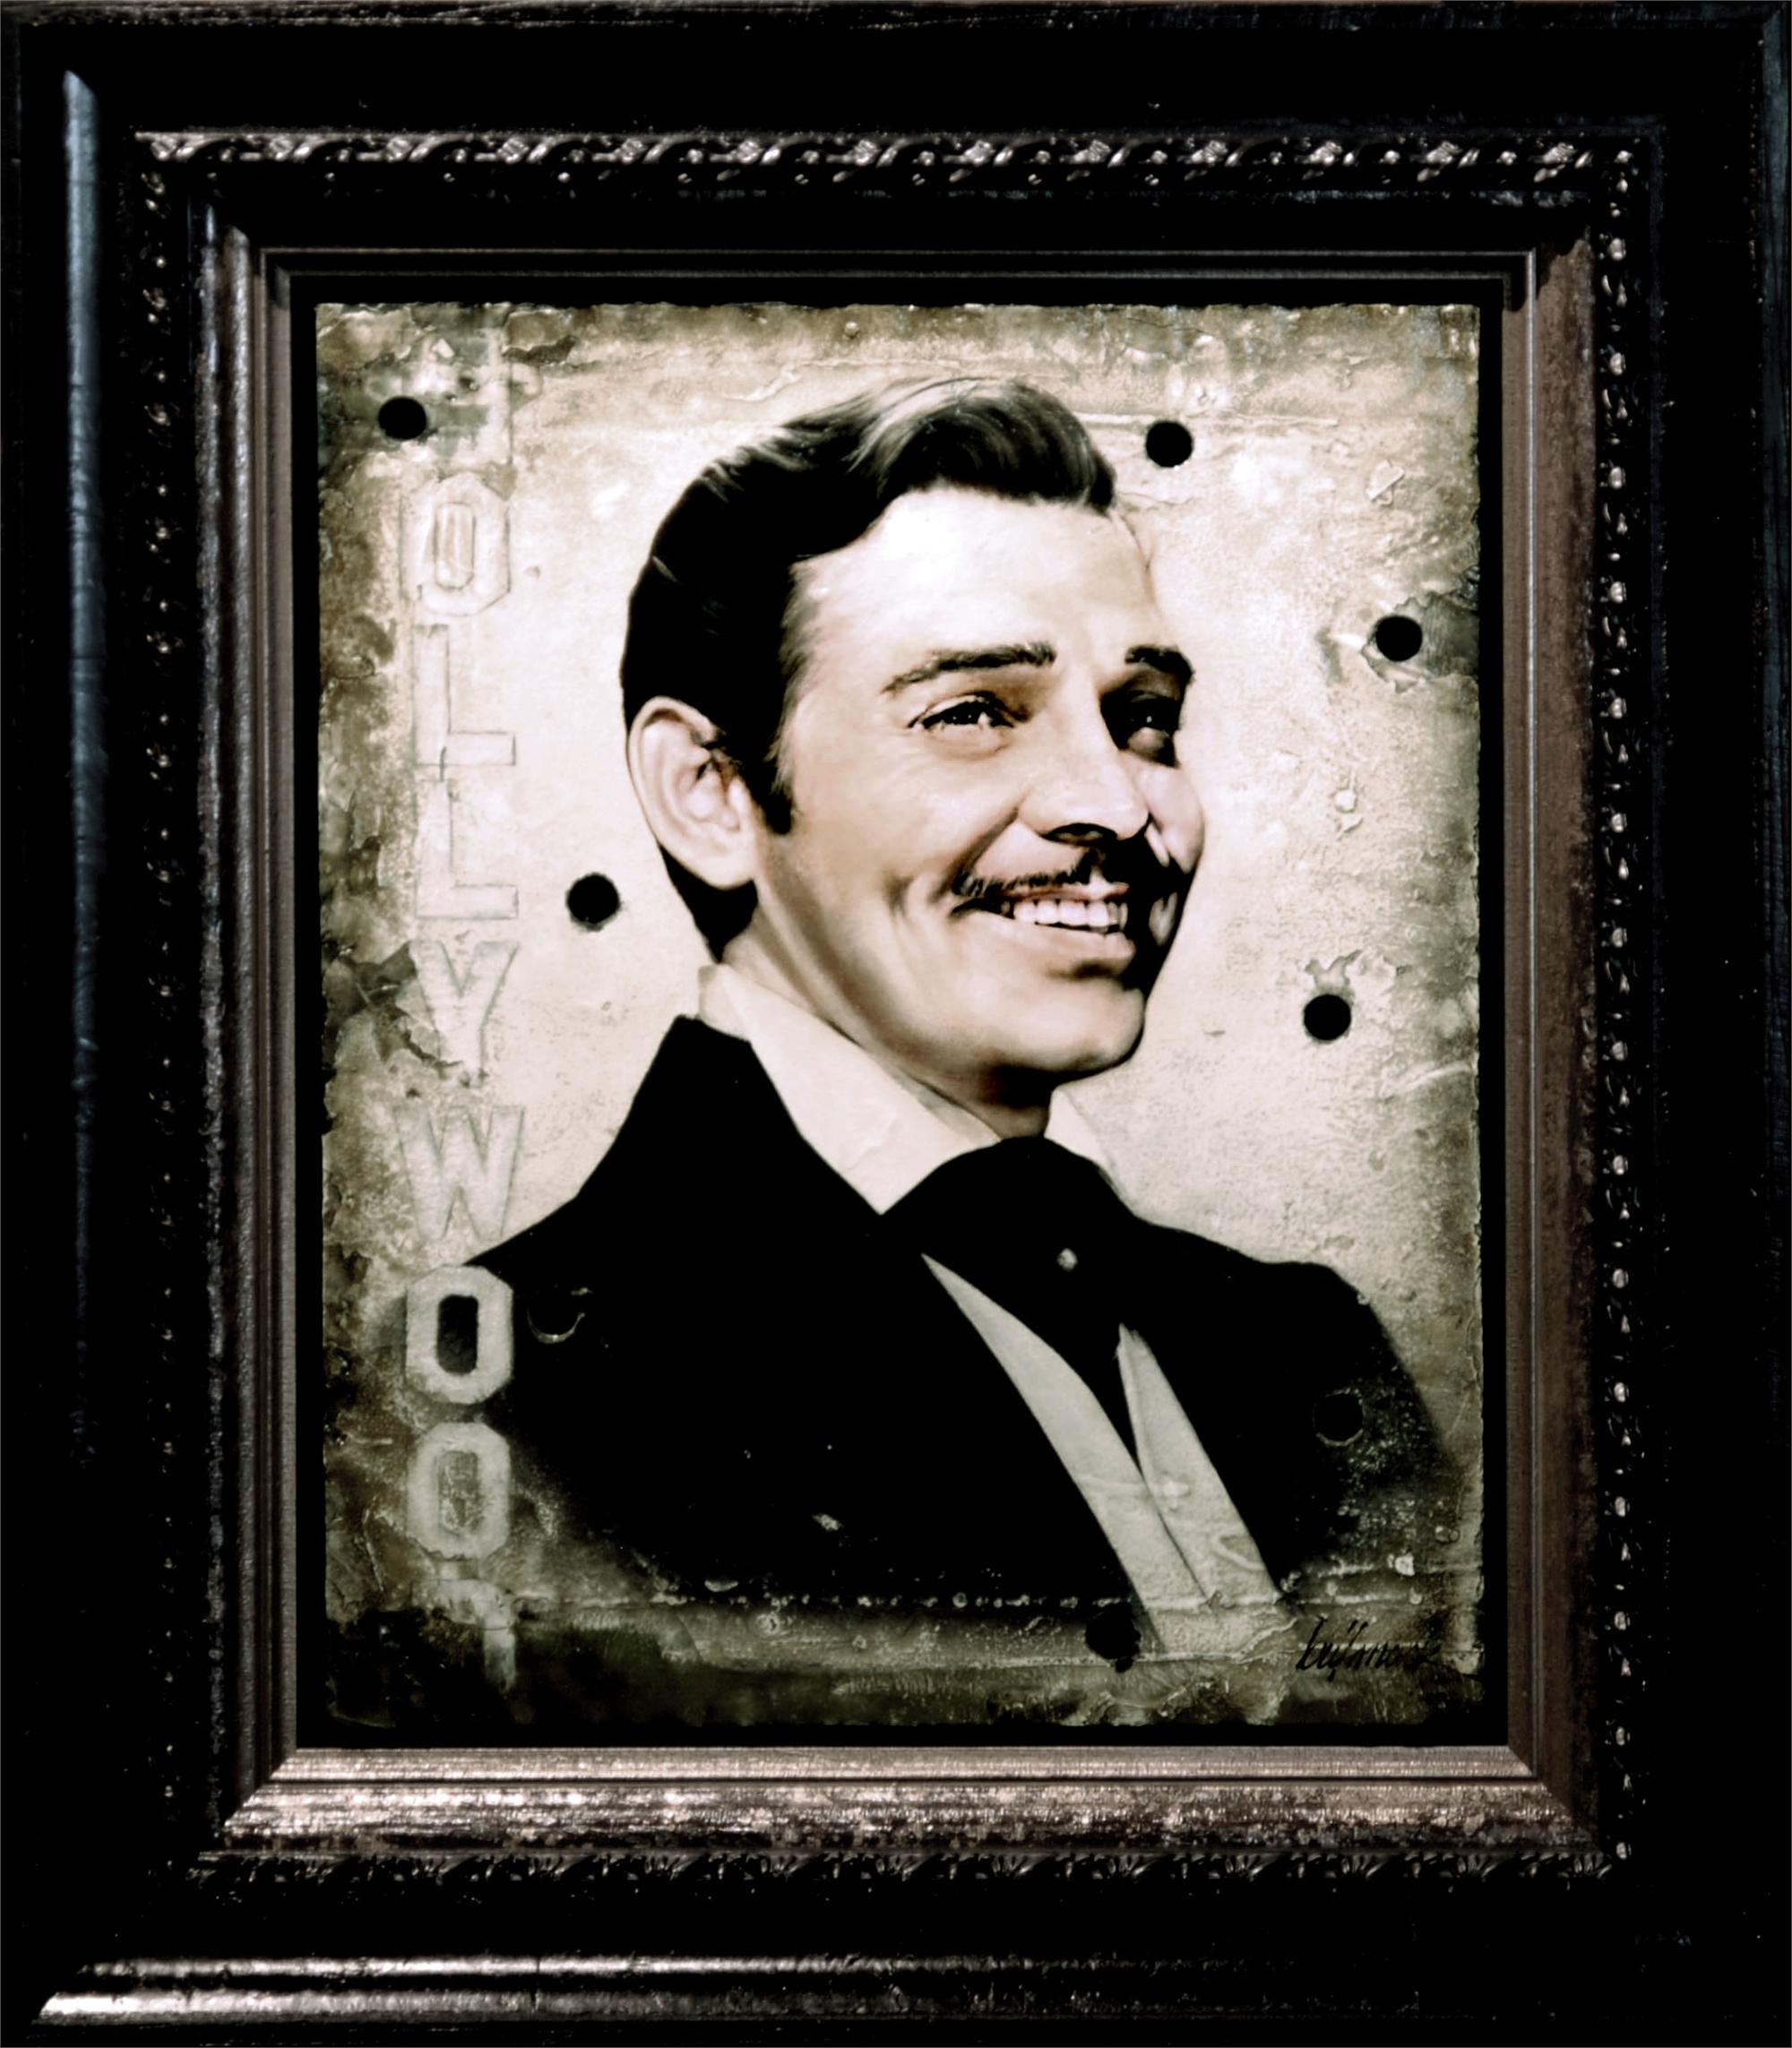 Clark Gable by Bill Mack